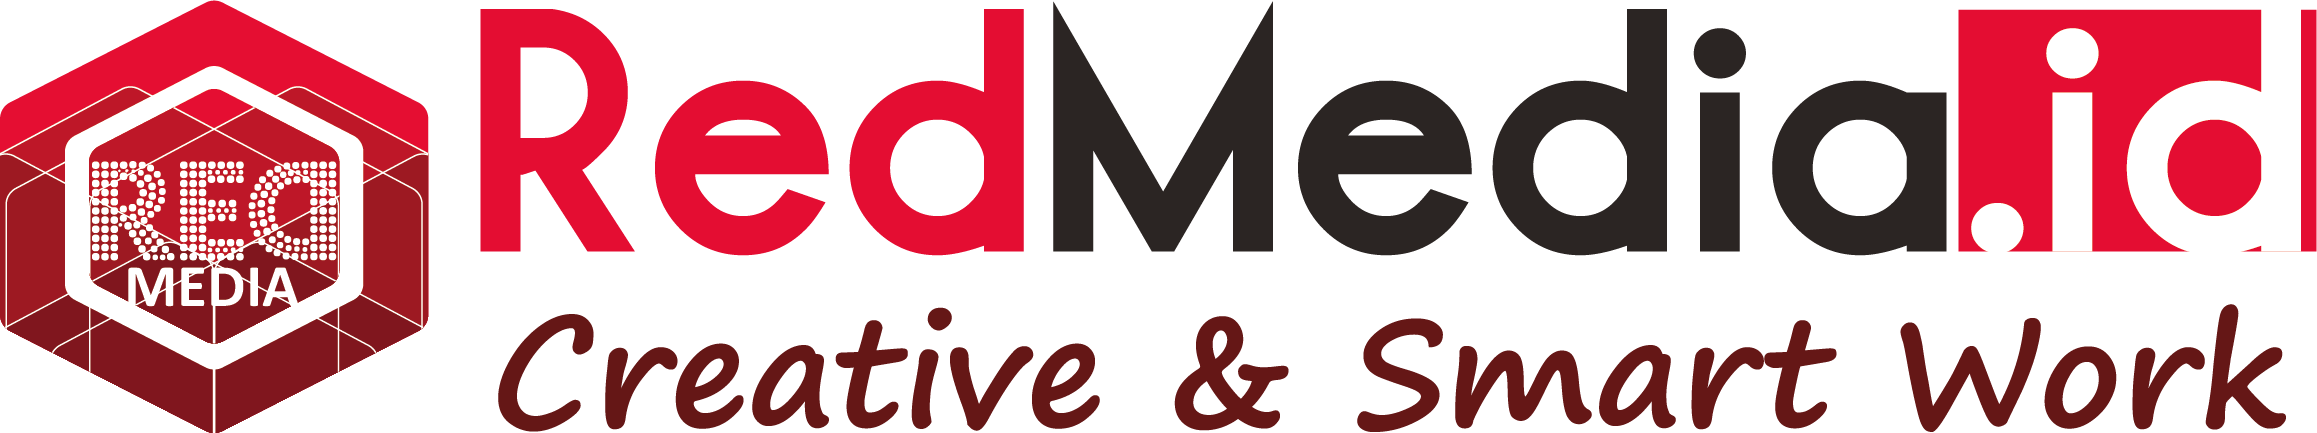 red media indonesia